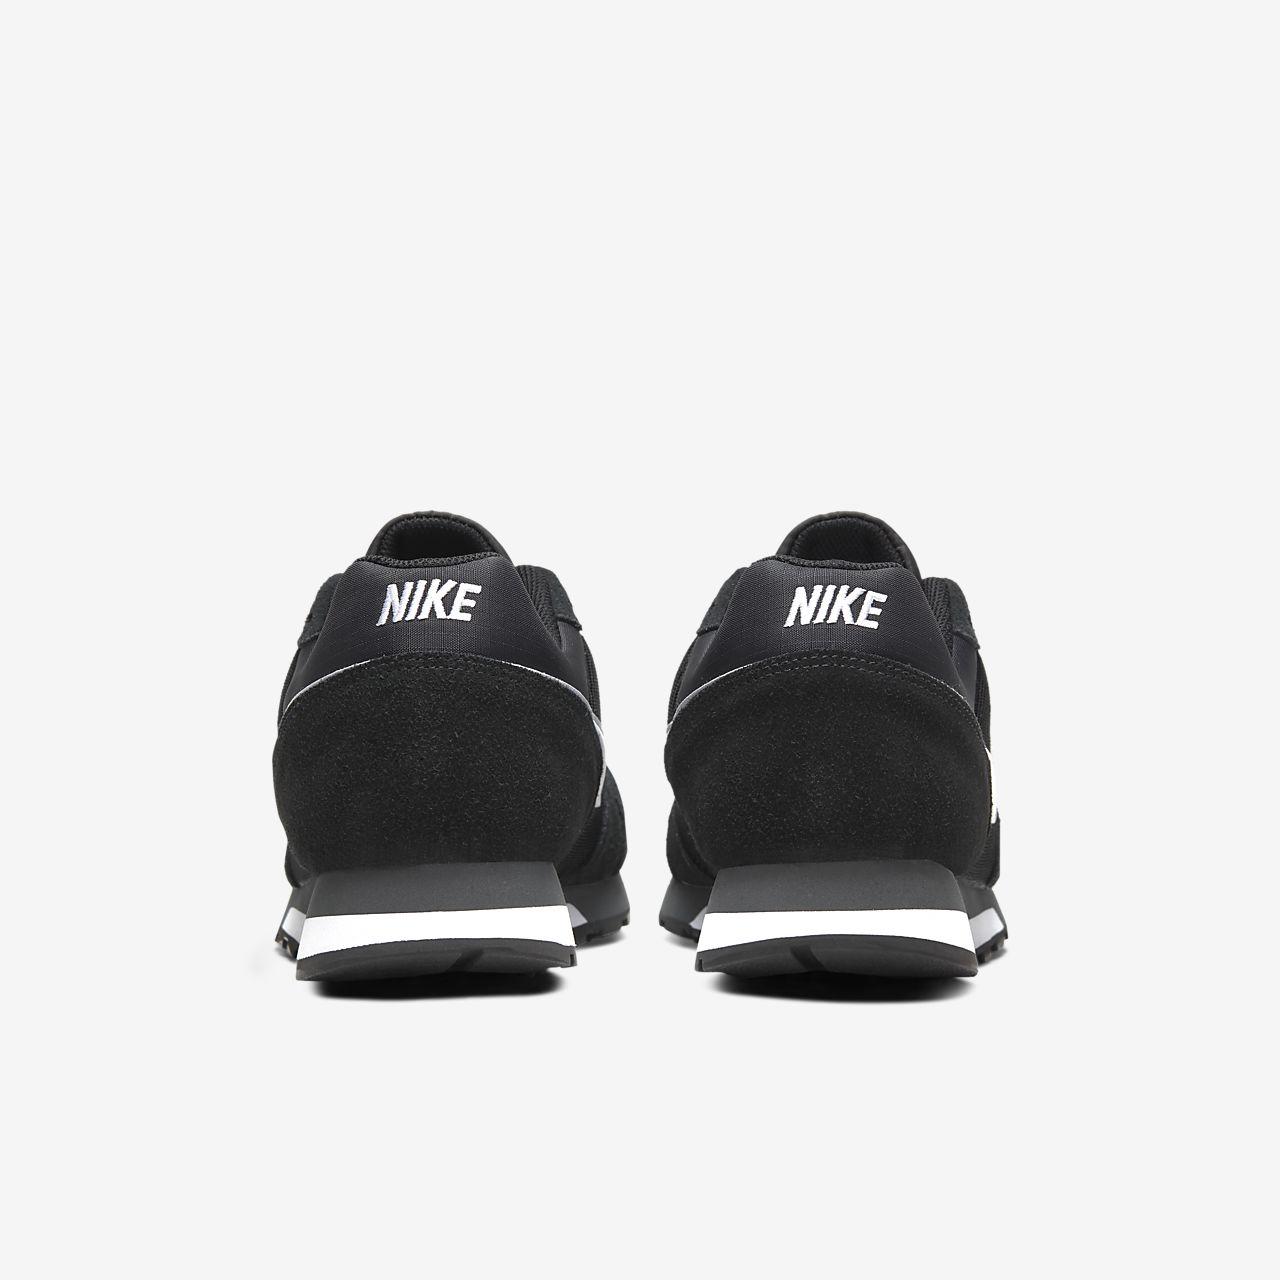 official photos 4fac2 85d16 ... Nike MD Runner 2 Men s Shoe